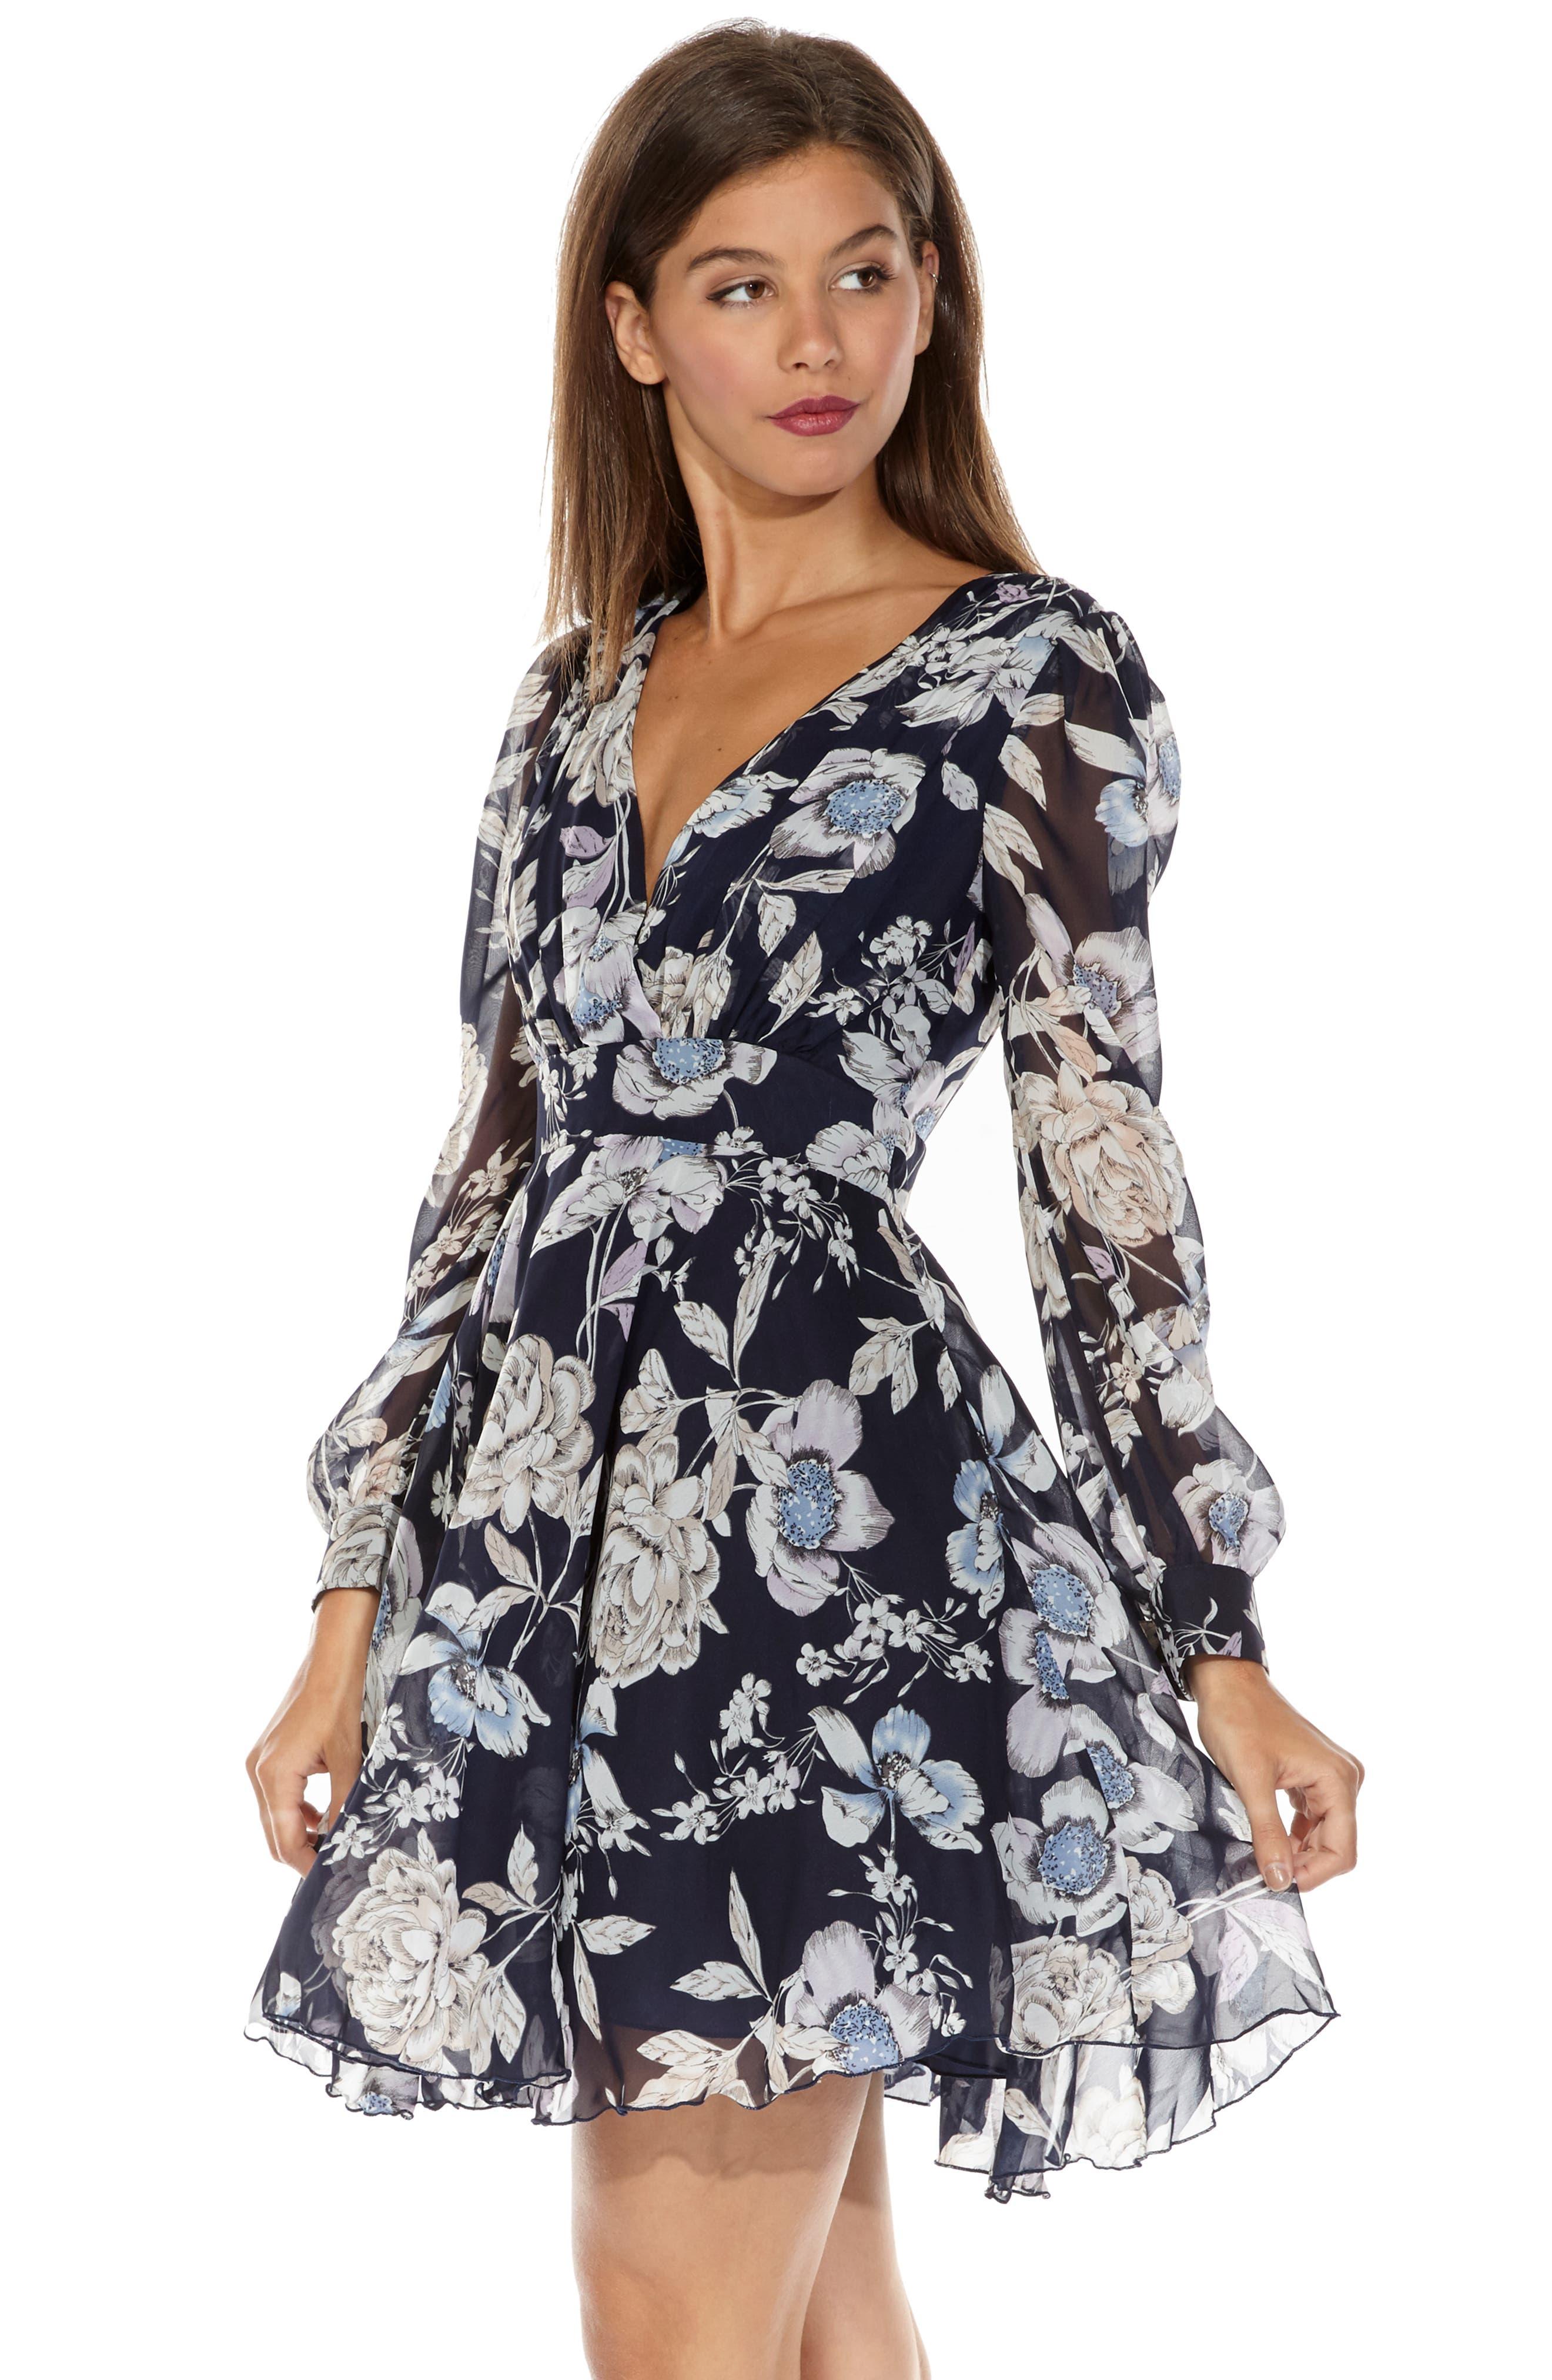 Nordi Floral Fit & Flare Party Dress,                             Alternate thumbnail 4, color,                             FLORAL PRINT